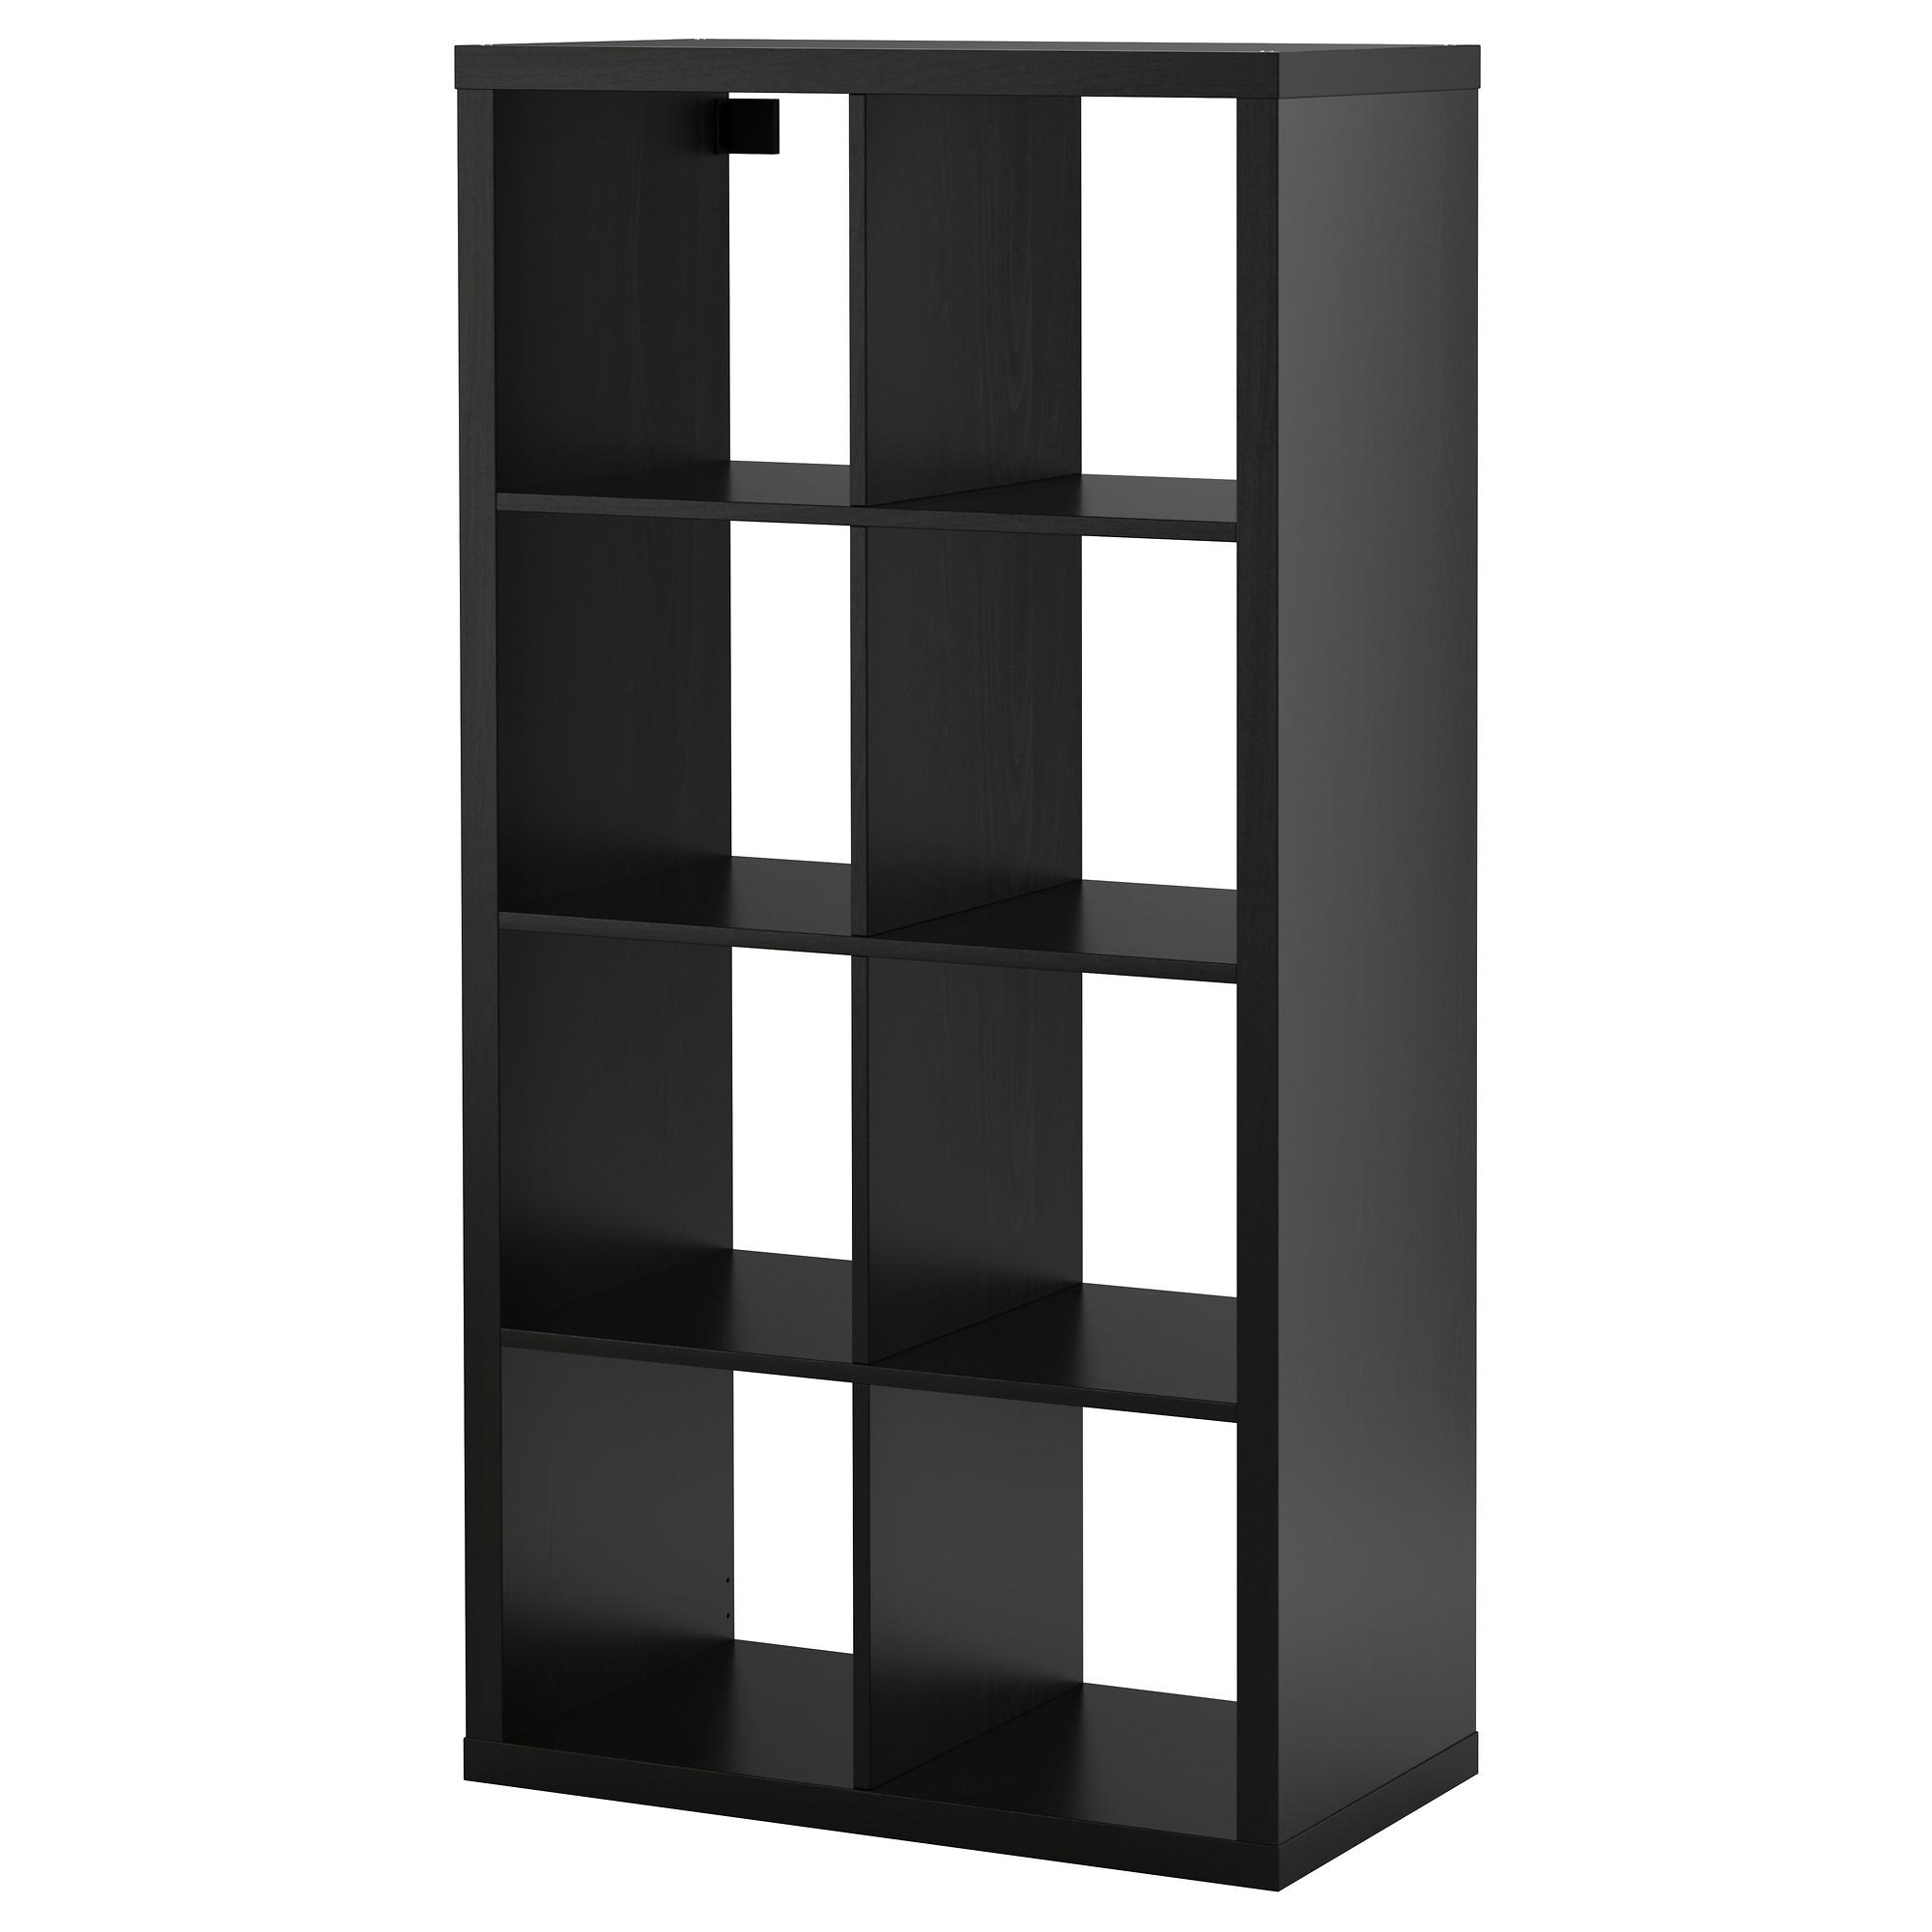 shelf units kallax shelf unit, black-brown width: 30 3/8  NYJYQTO